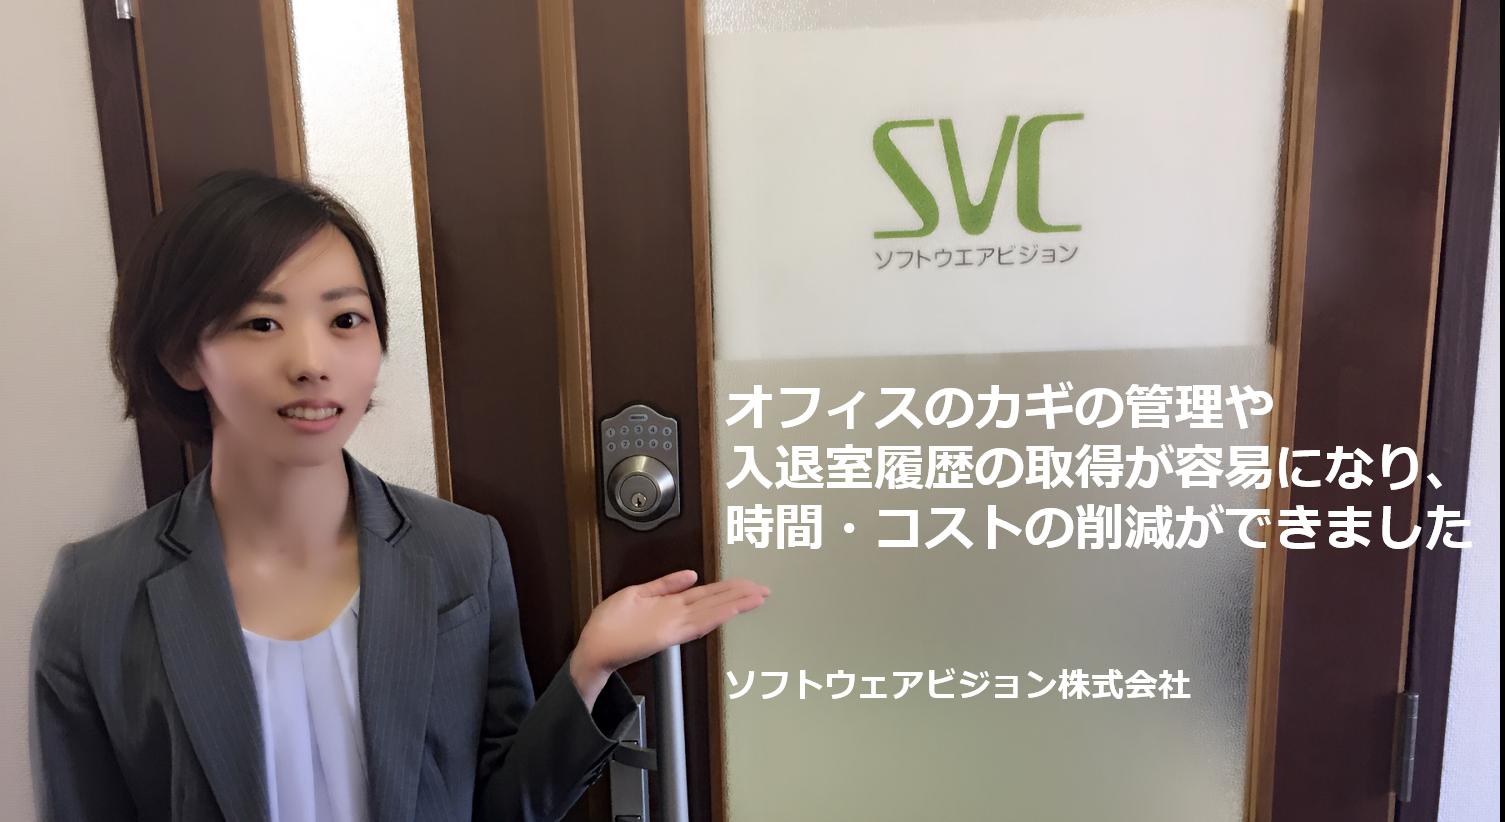 SV_事例.png